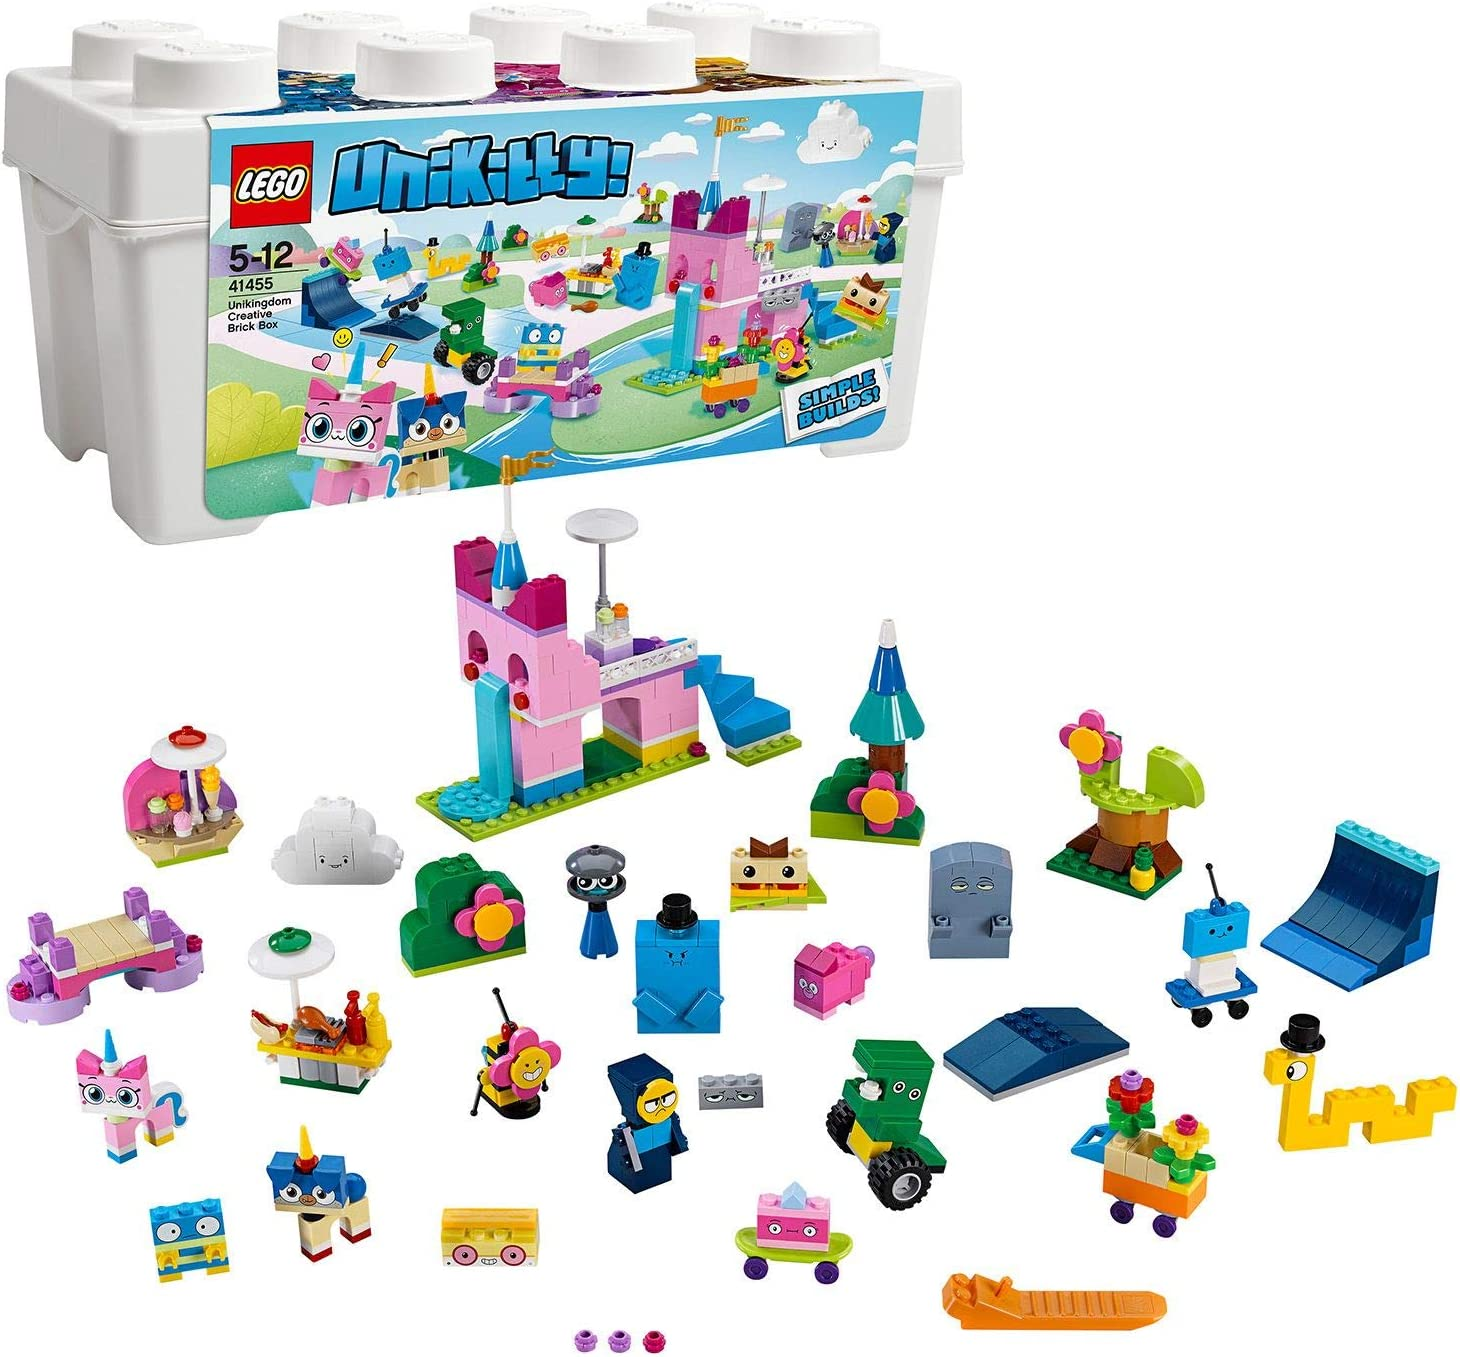 LEGO Unikitty - Caja de Ladrillos Creativos del Unireino, Juguete ...